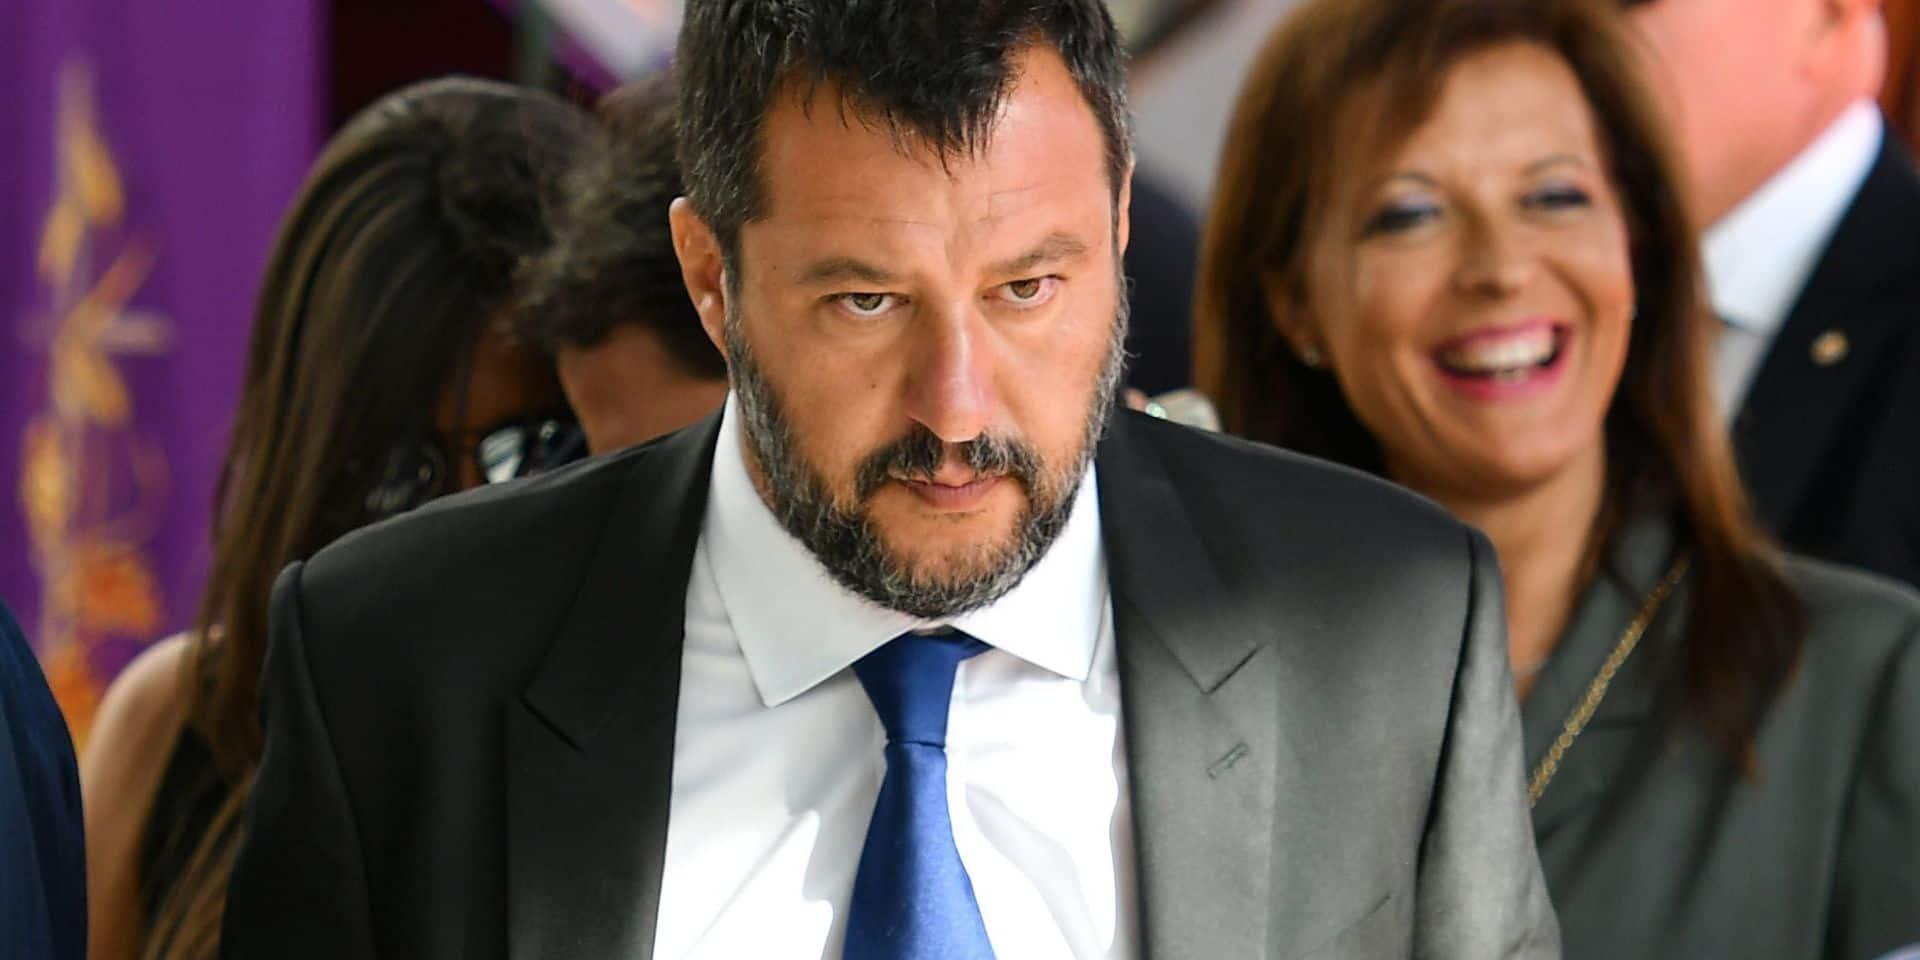 Édito: le coup de poker de Salvini